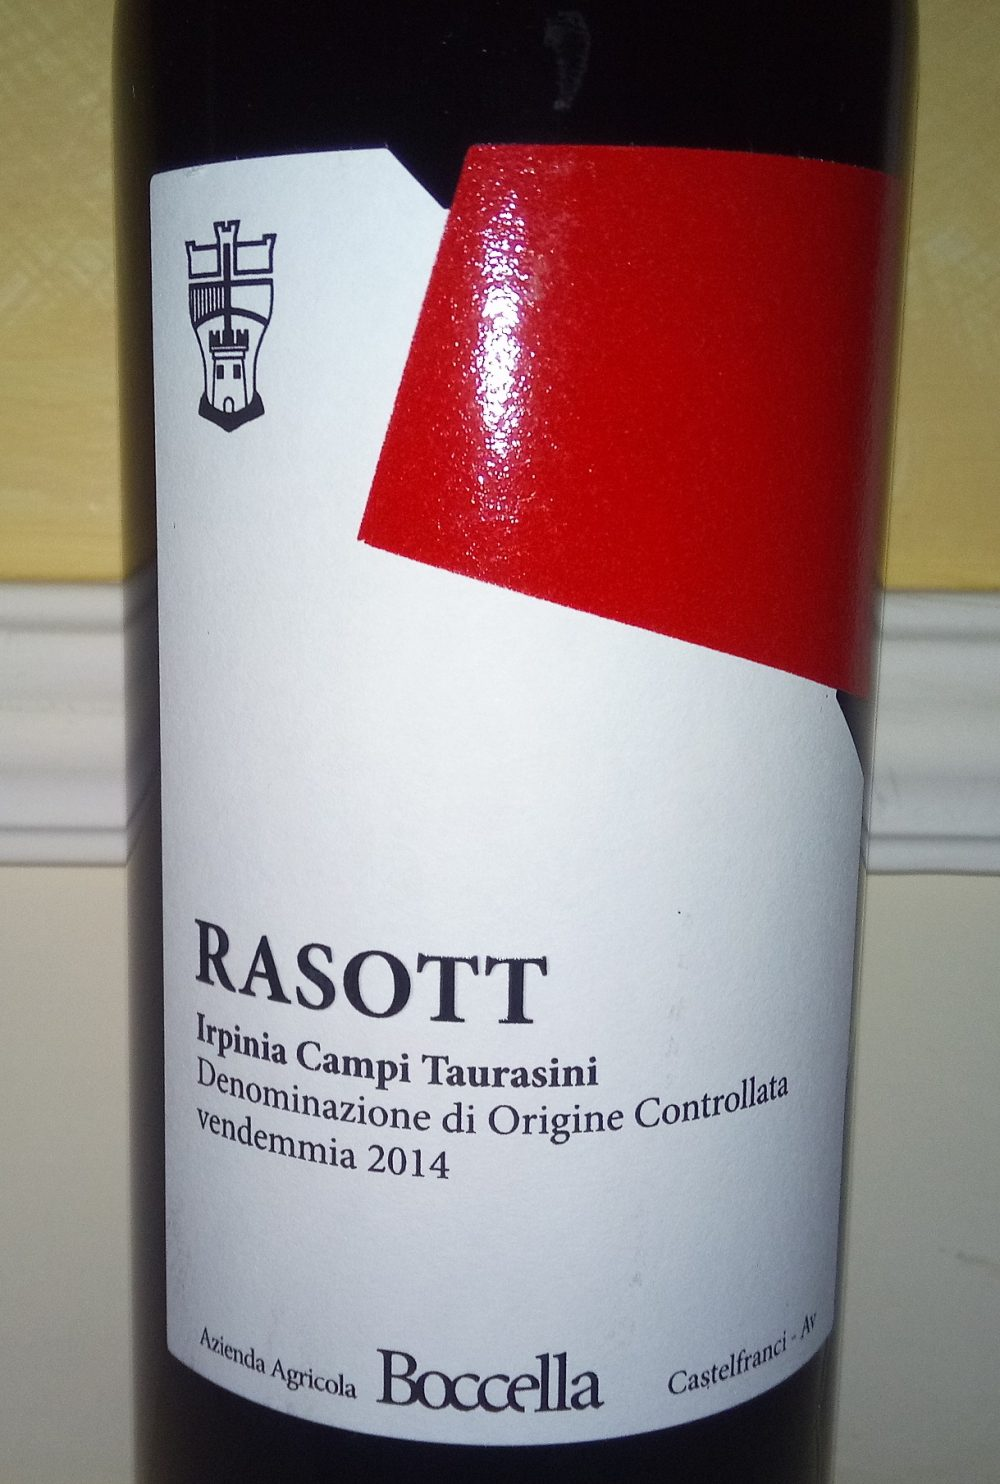 Rasott Irpinia Campi Taurasini Doc 2014 Boccella